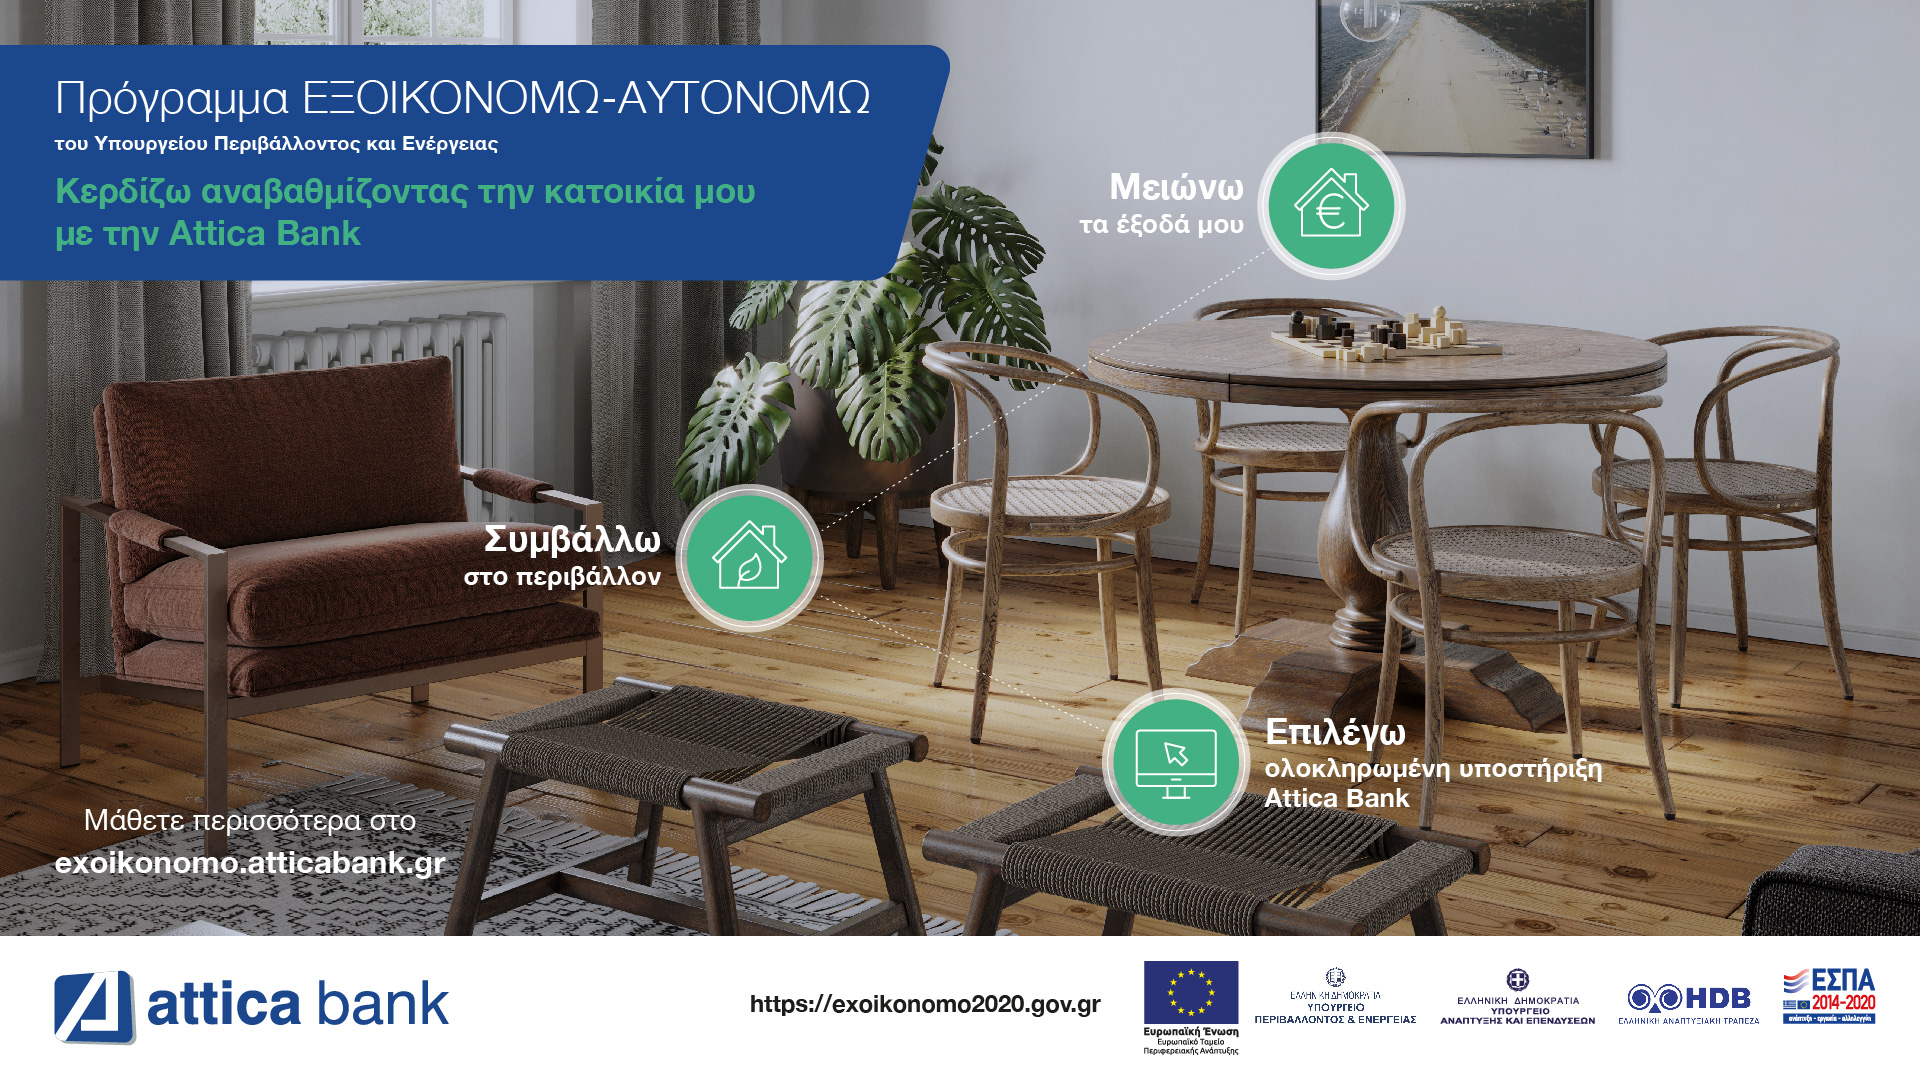 AtticaBank - Εξοικονομώ Αυτονομώ